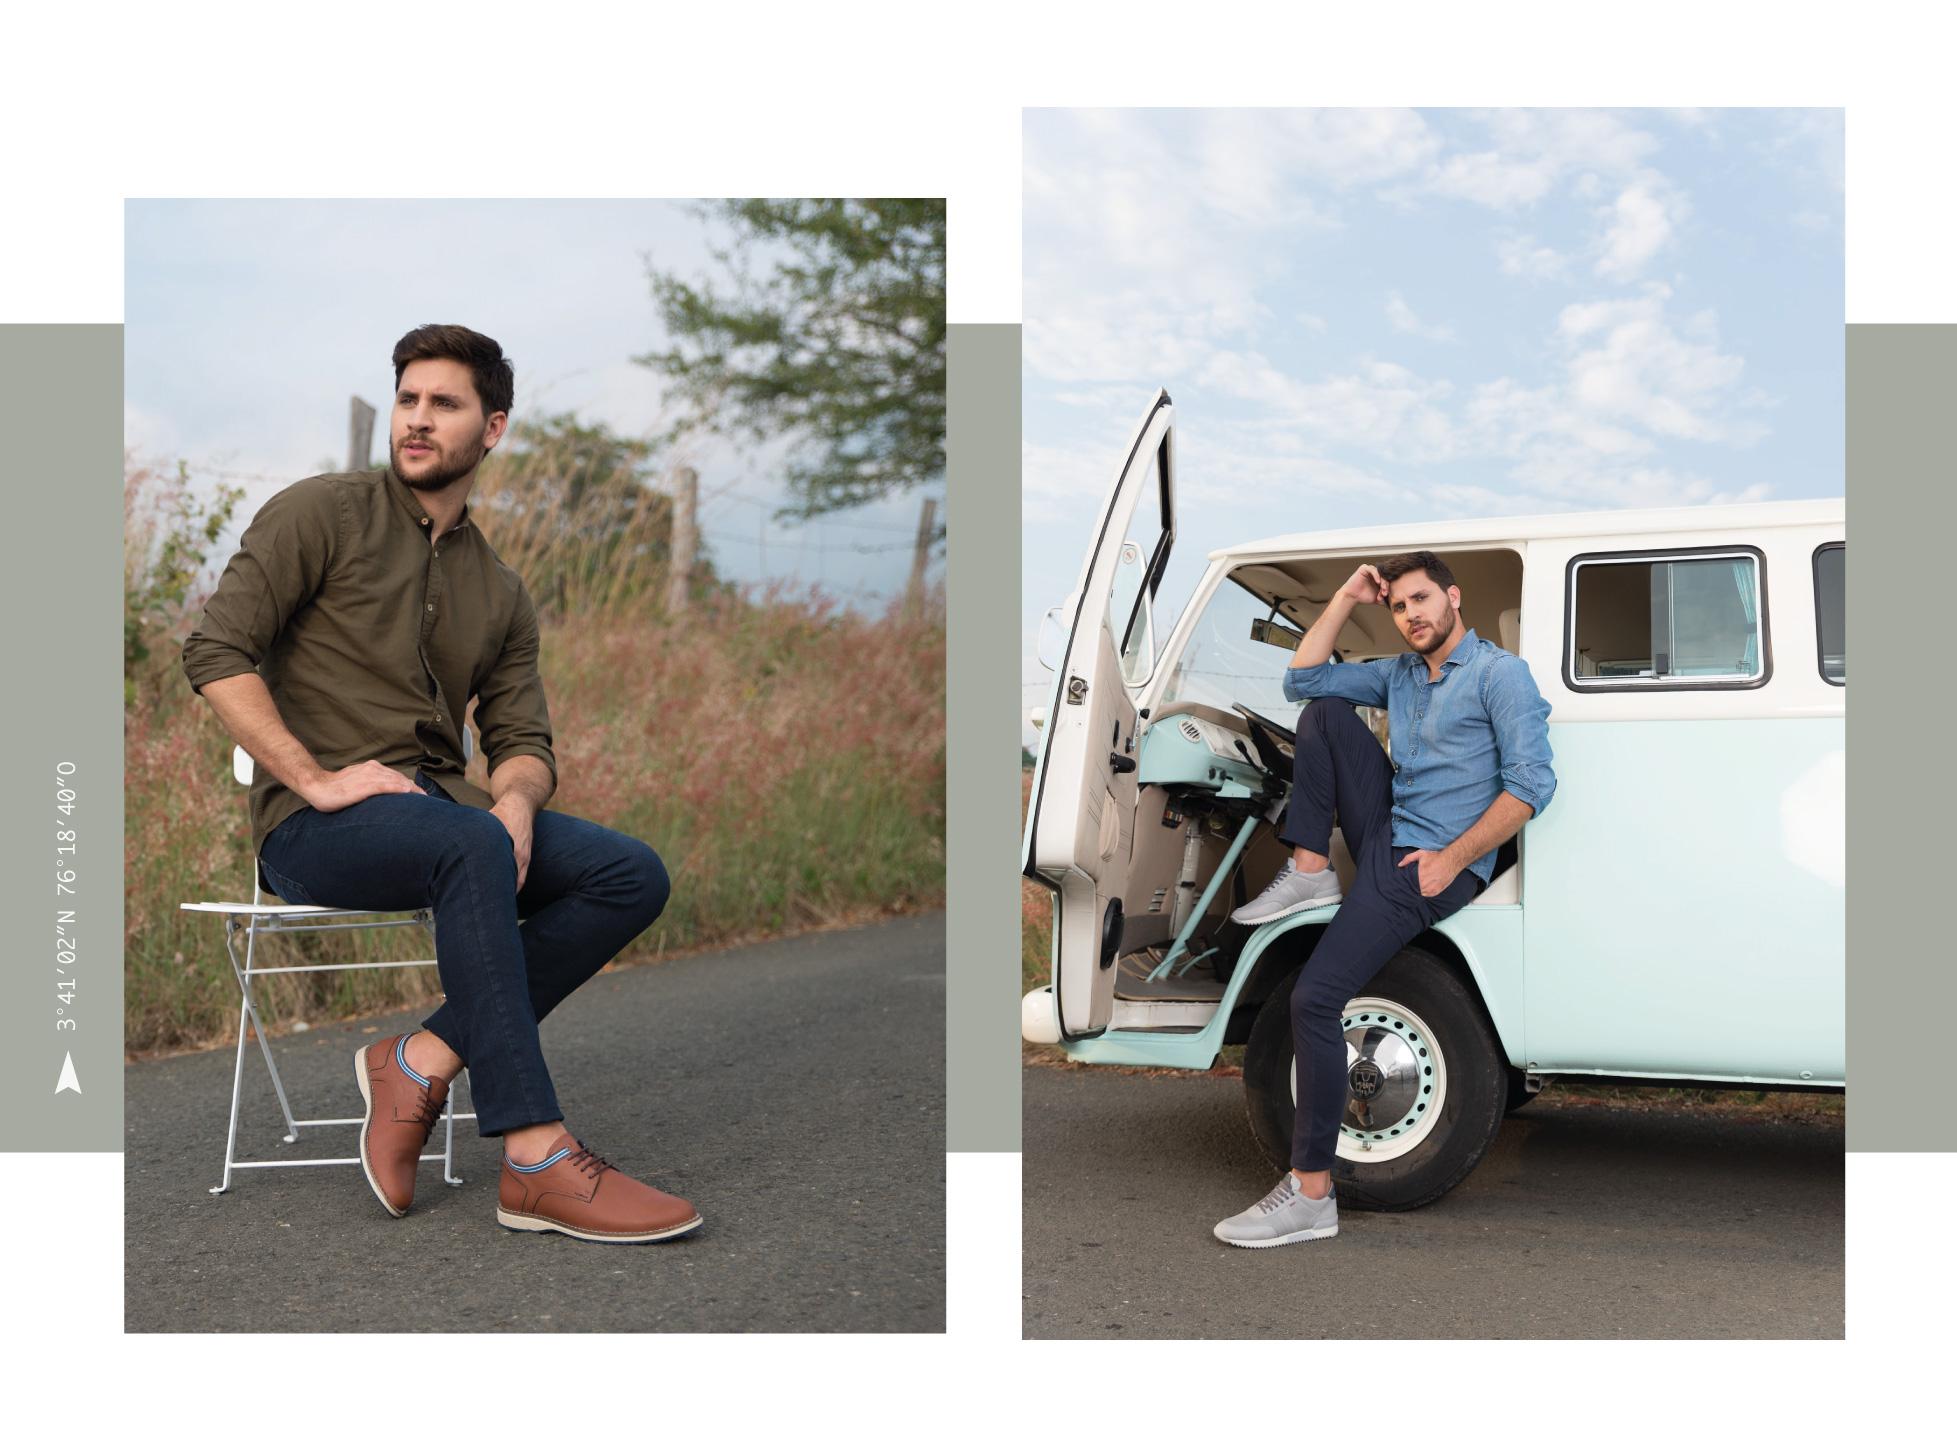 Josh-Verano-Cali-Shoes-Life-Campaña-3